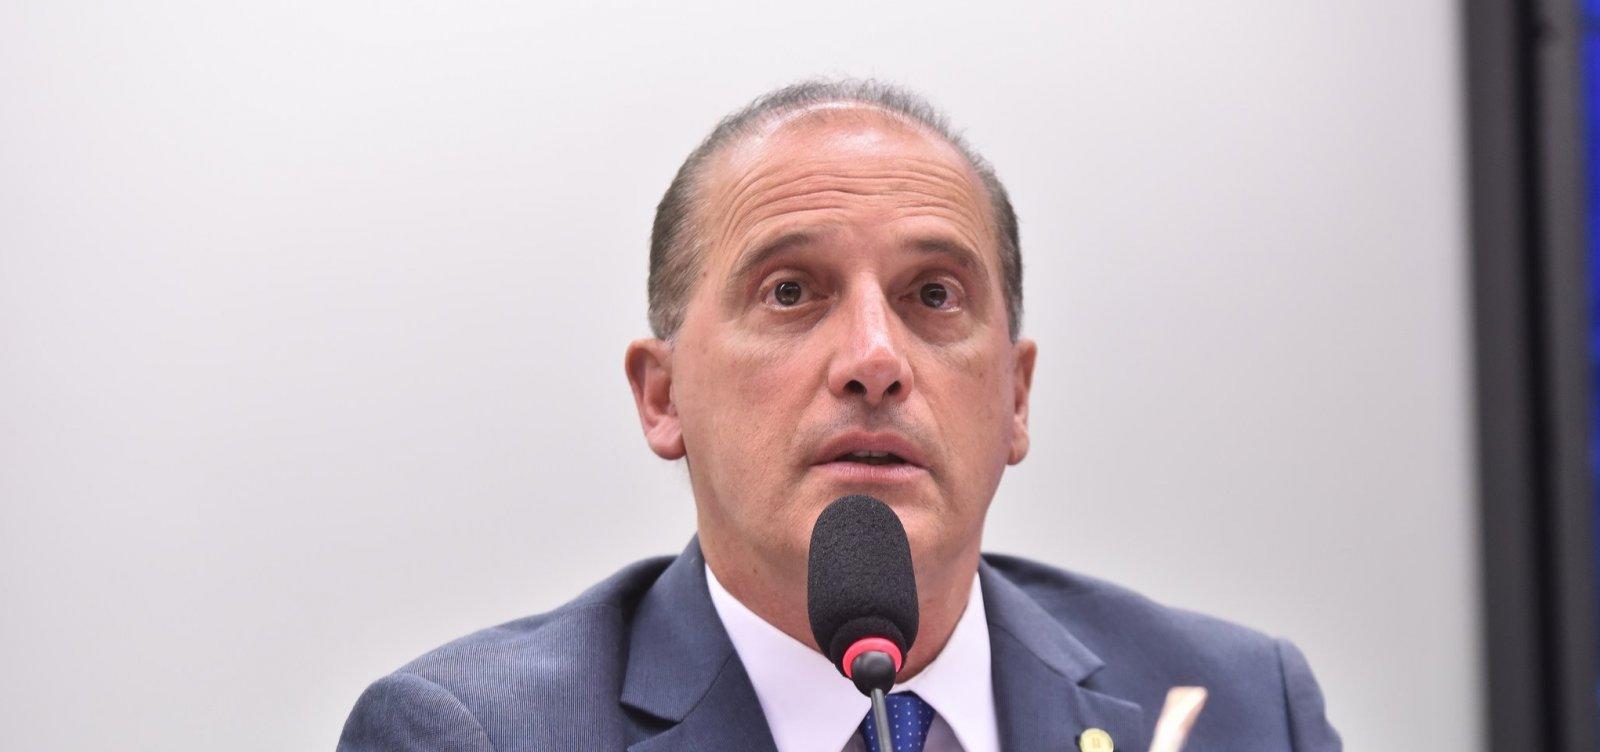 [Proposta da Previdência de Temer é 'medíocre e pouco inteligente', diz futuro ministro de Bolsonaro]